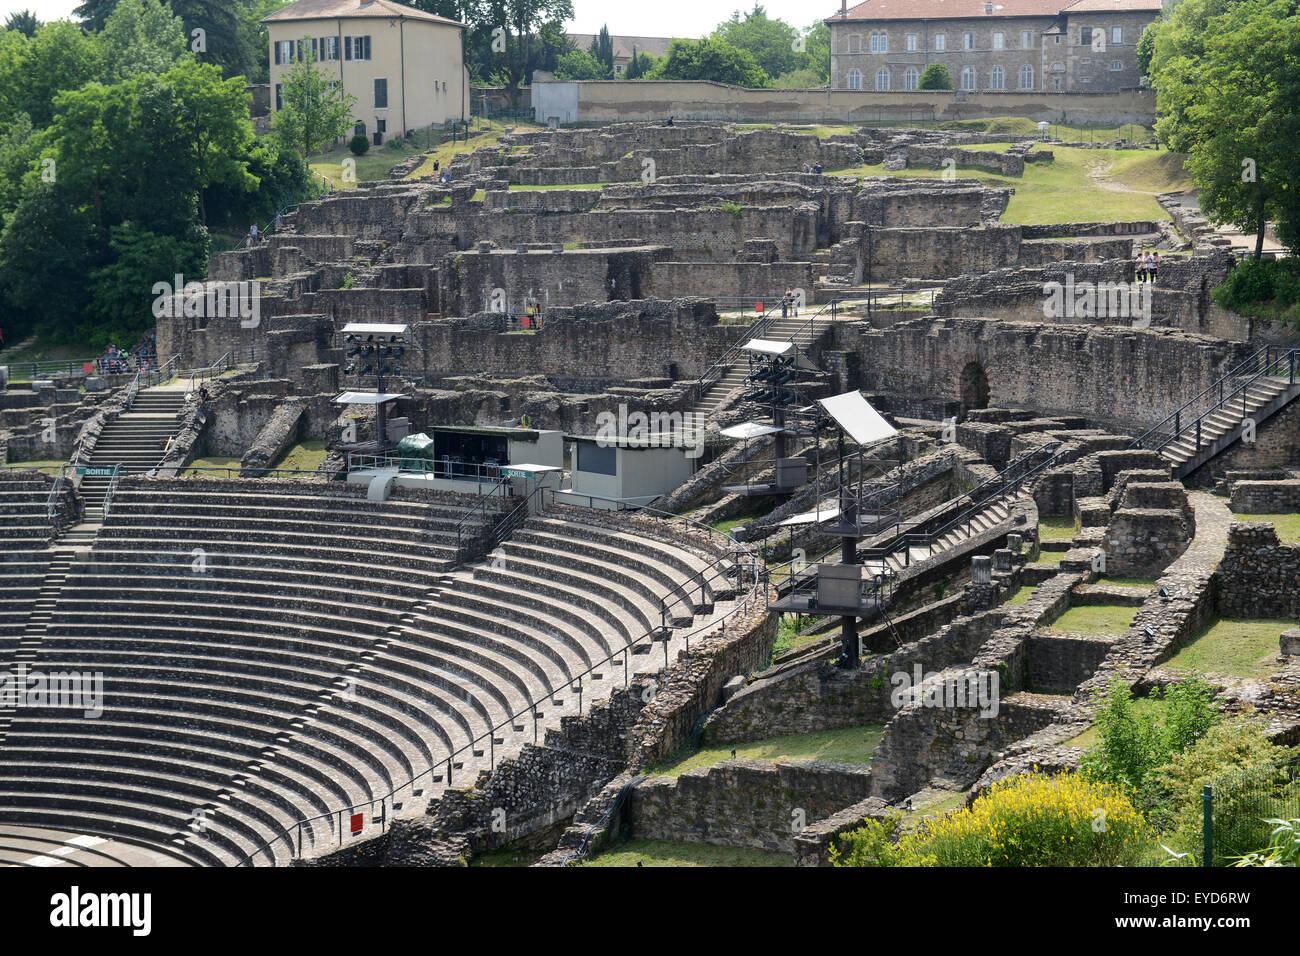 Roman Amphitheater Lyon France - Stock Image